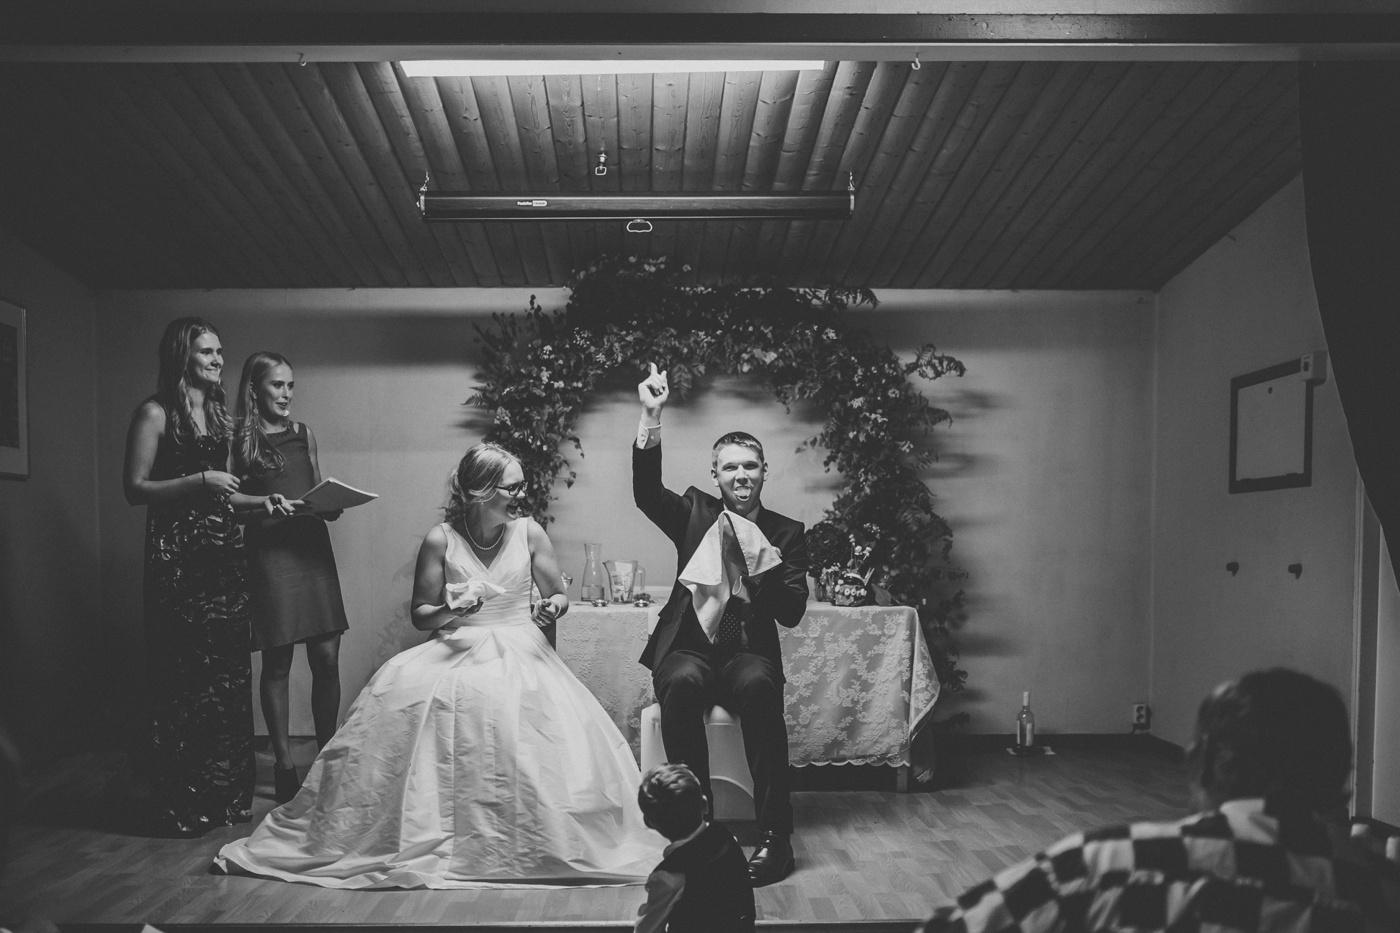 ceciliajoakim_sweden-countryside-summer-wedding_melbourne-fun-quirky-wedding-photography_80